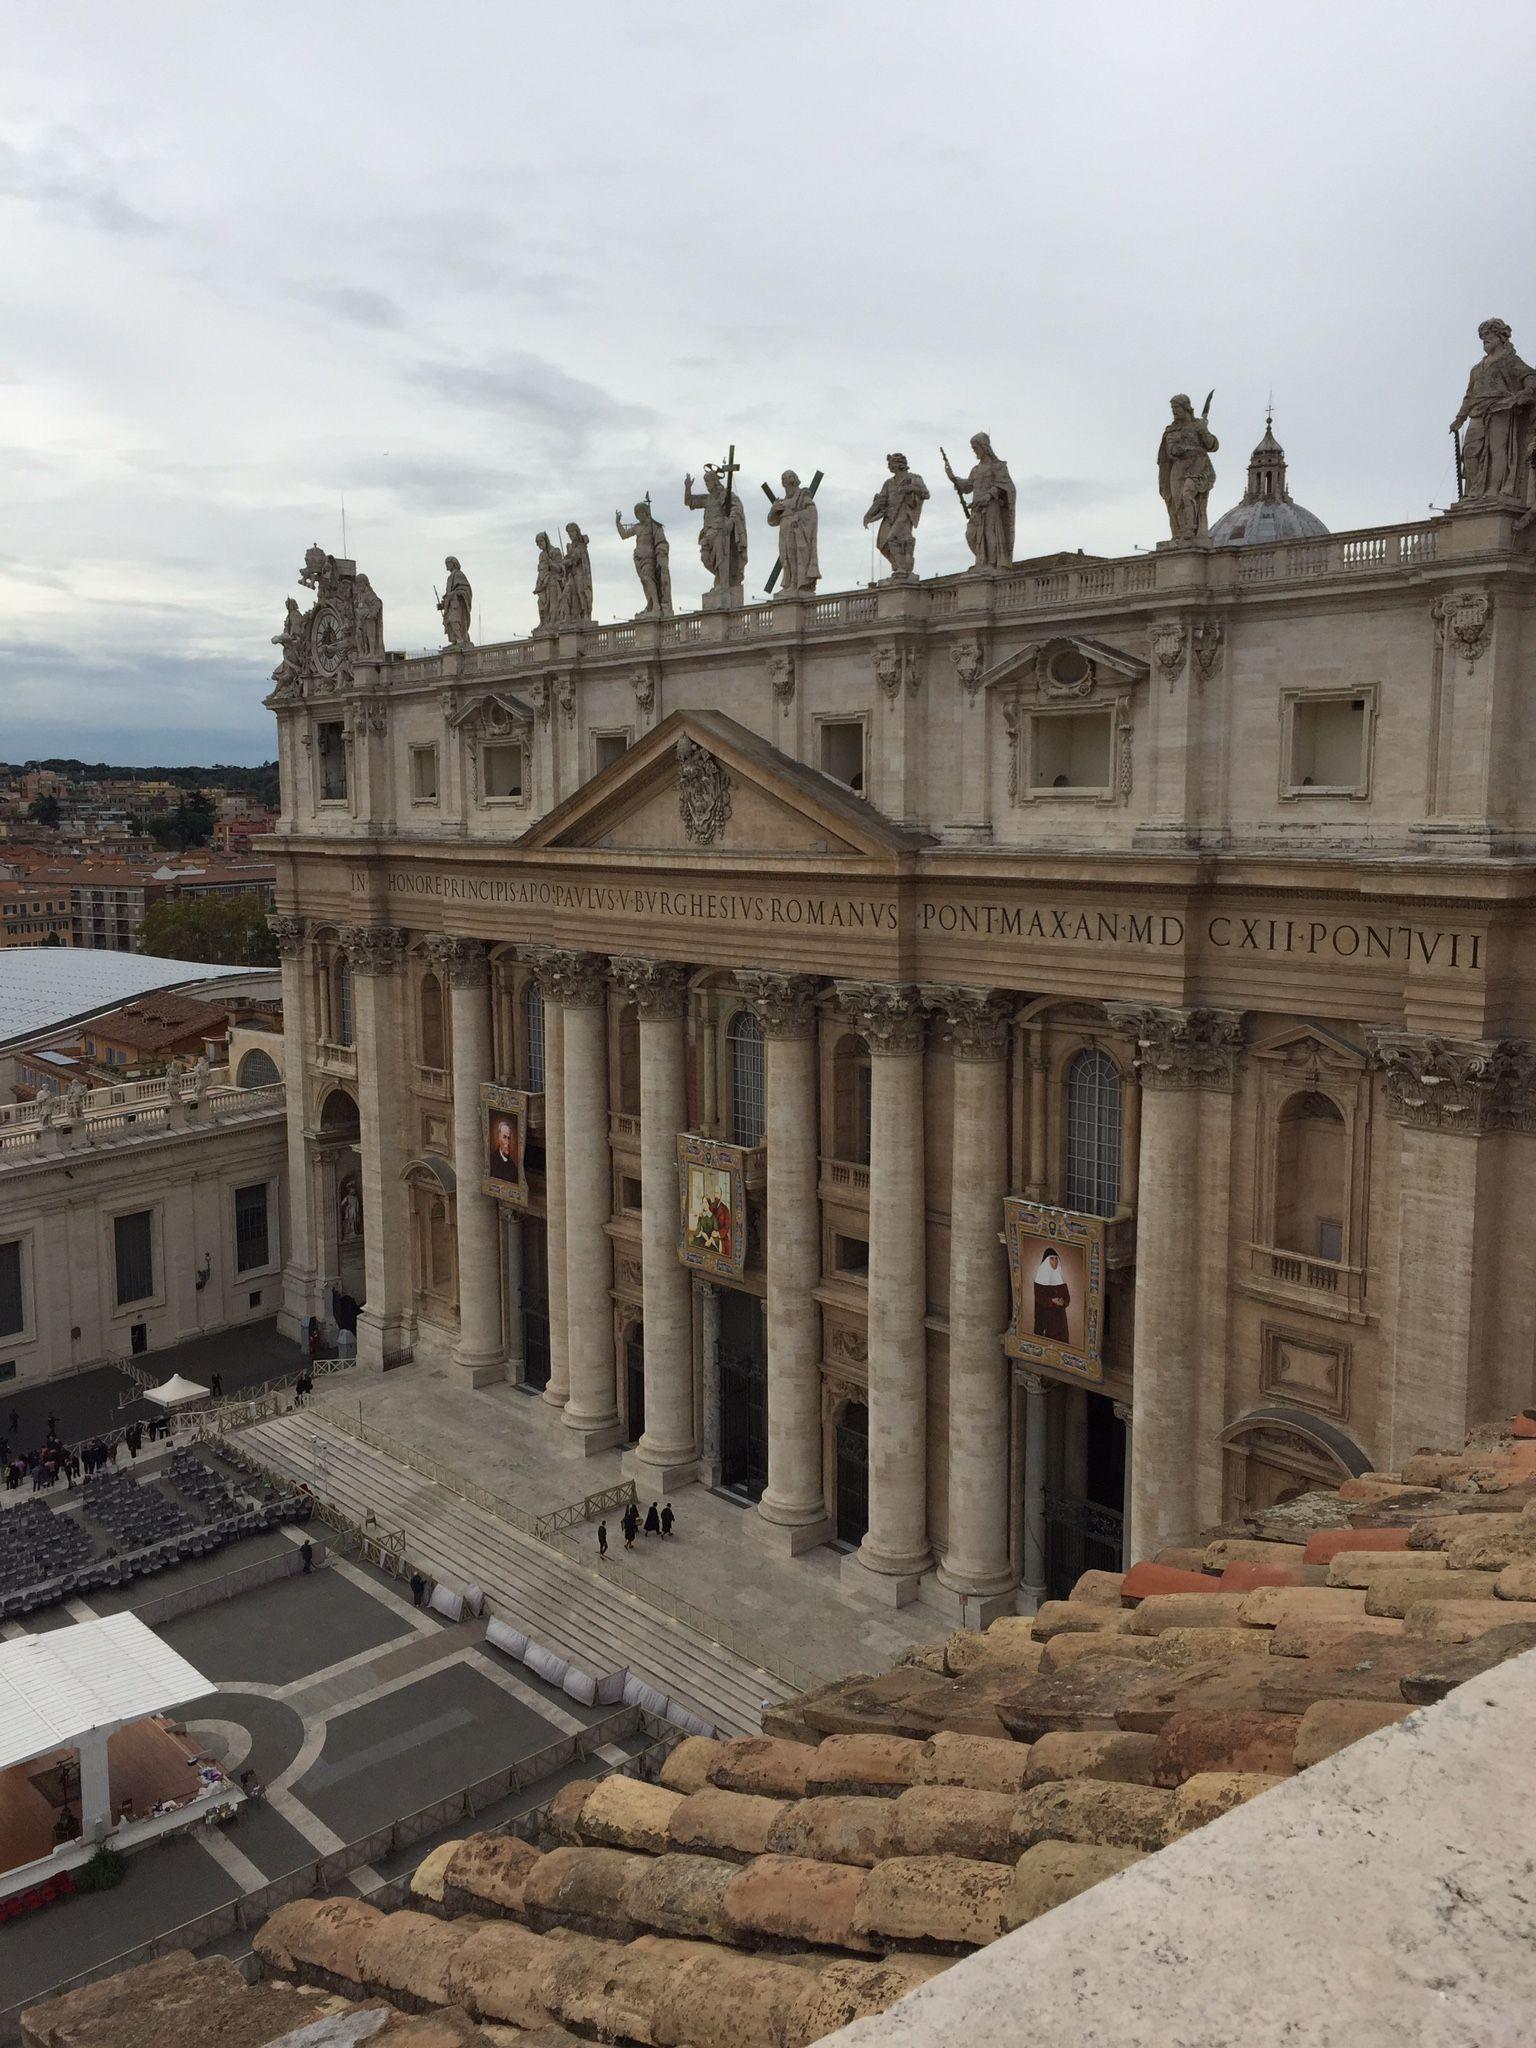 Vaticano...Vatican City In Rome #memorable #santuary